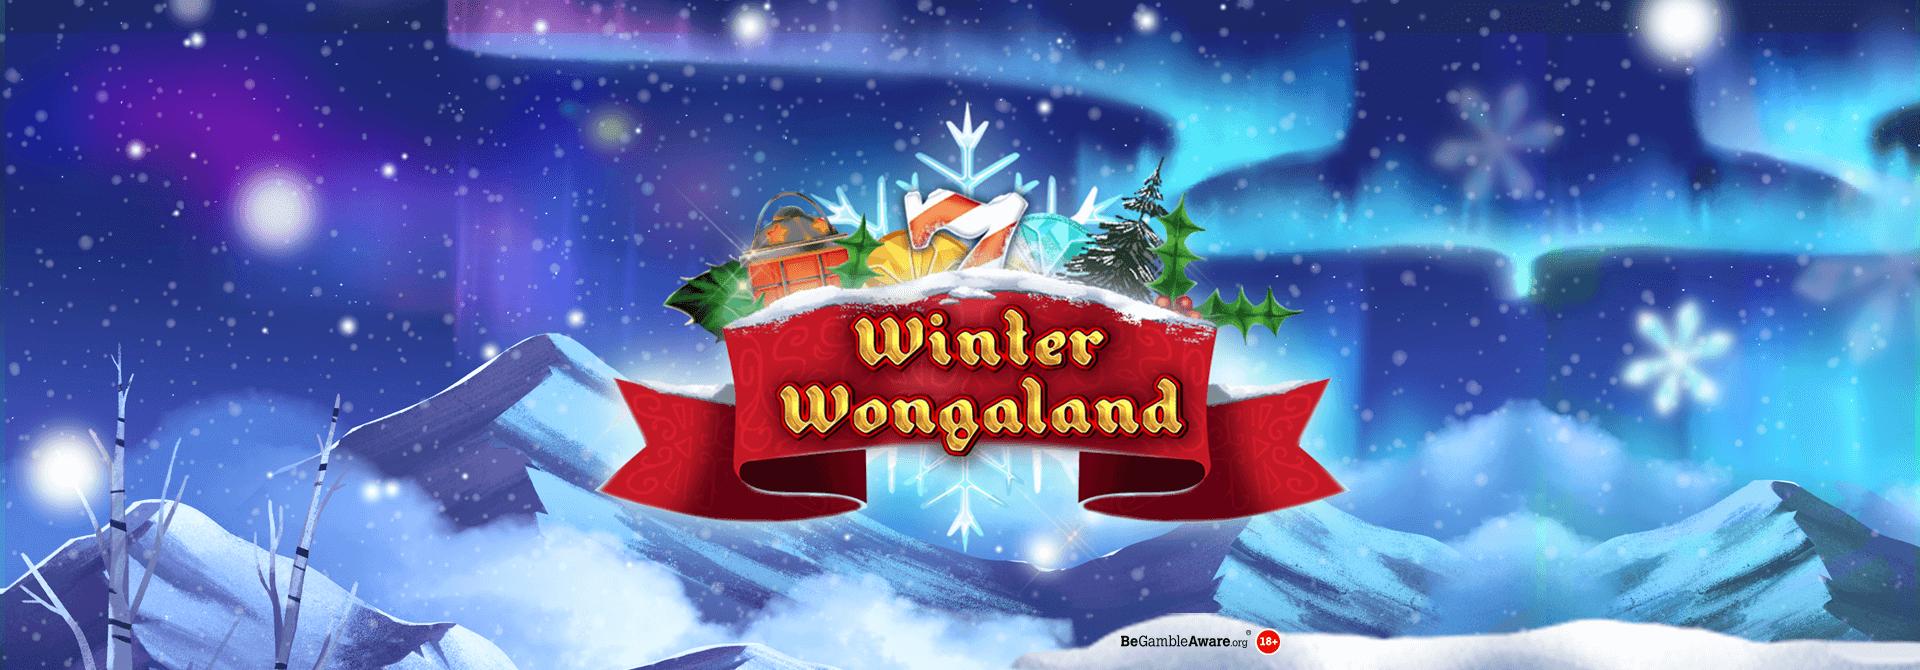 NEW GAME ALERT: Winter Wongaland